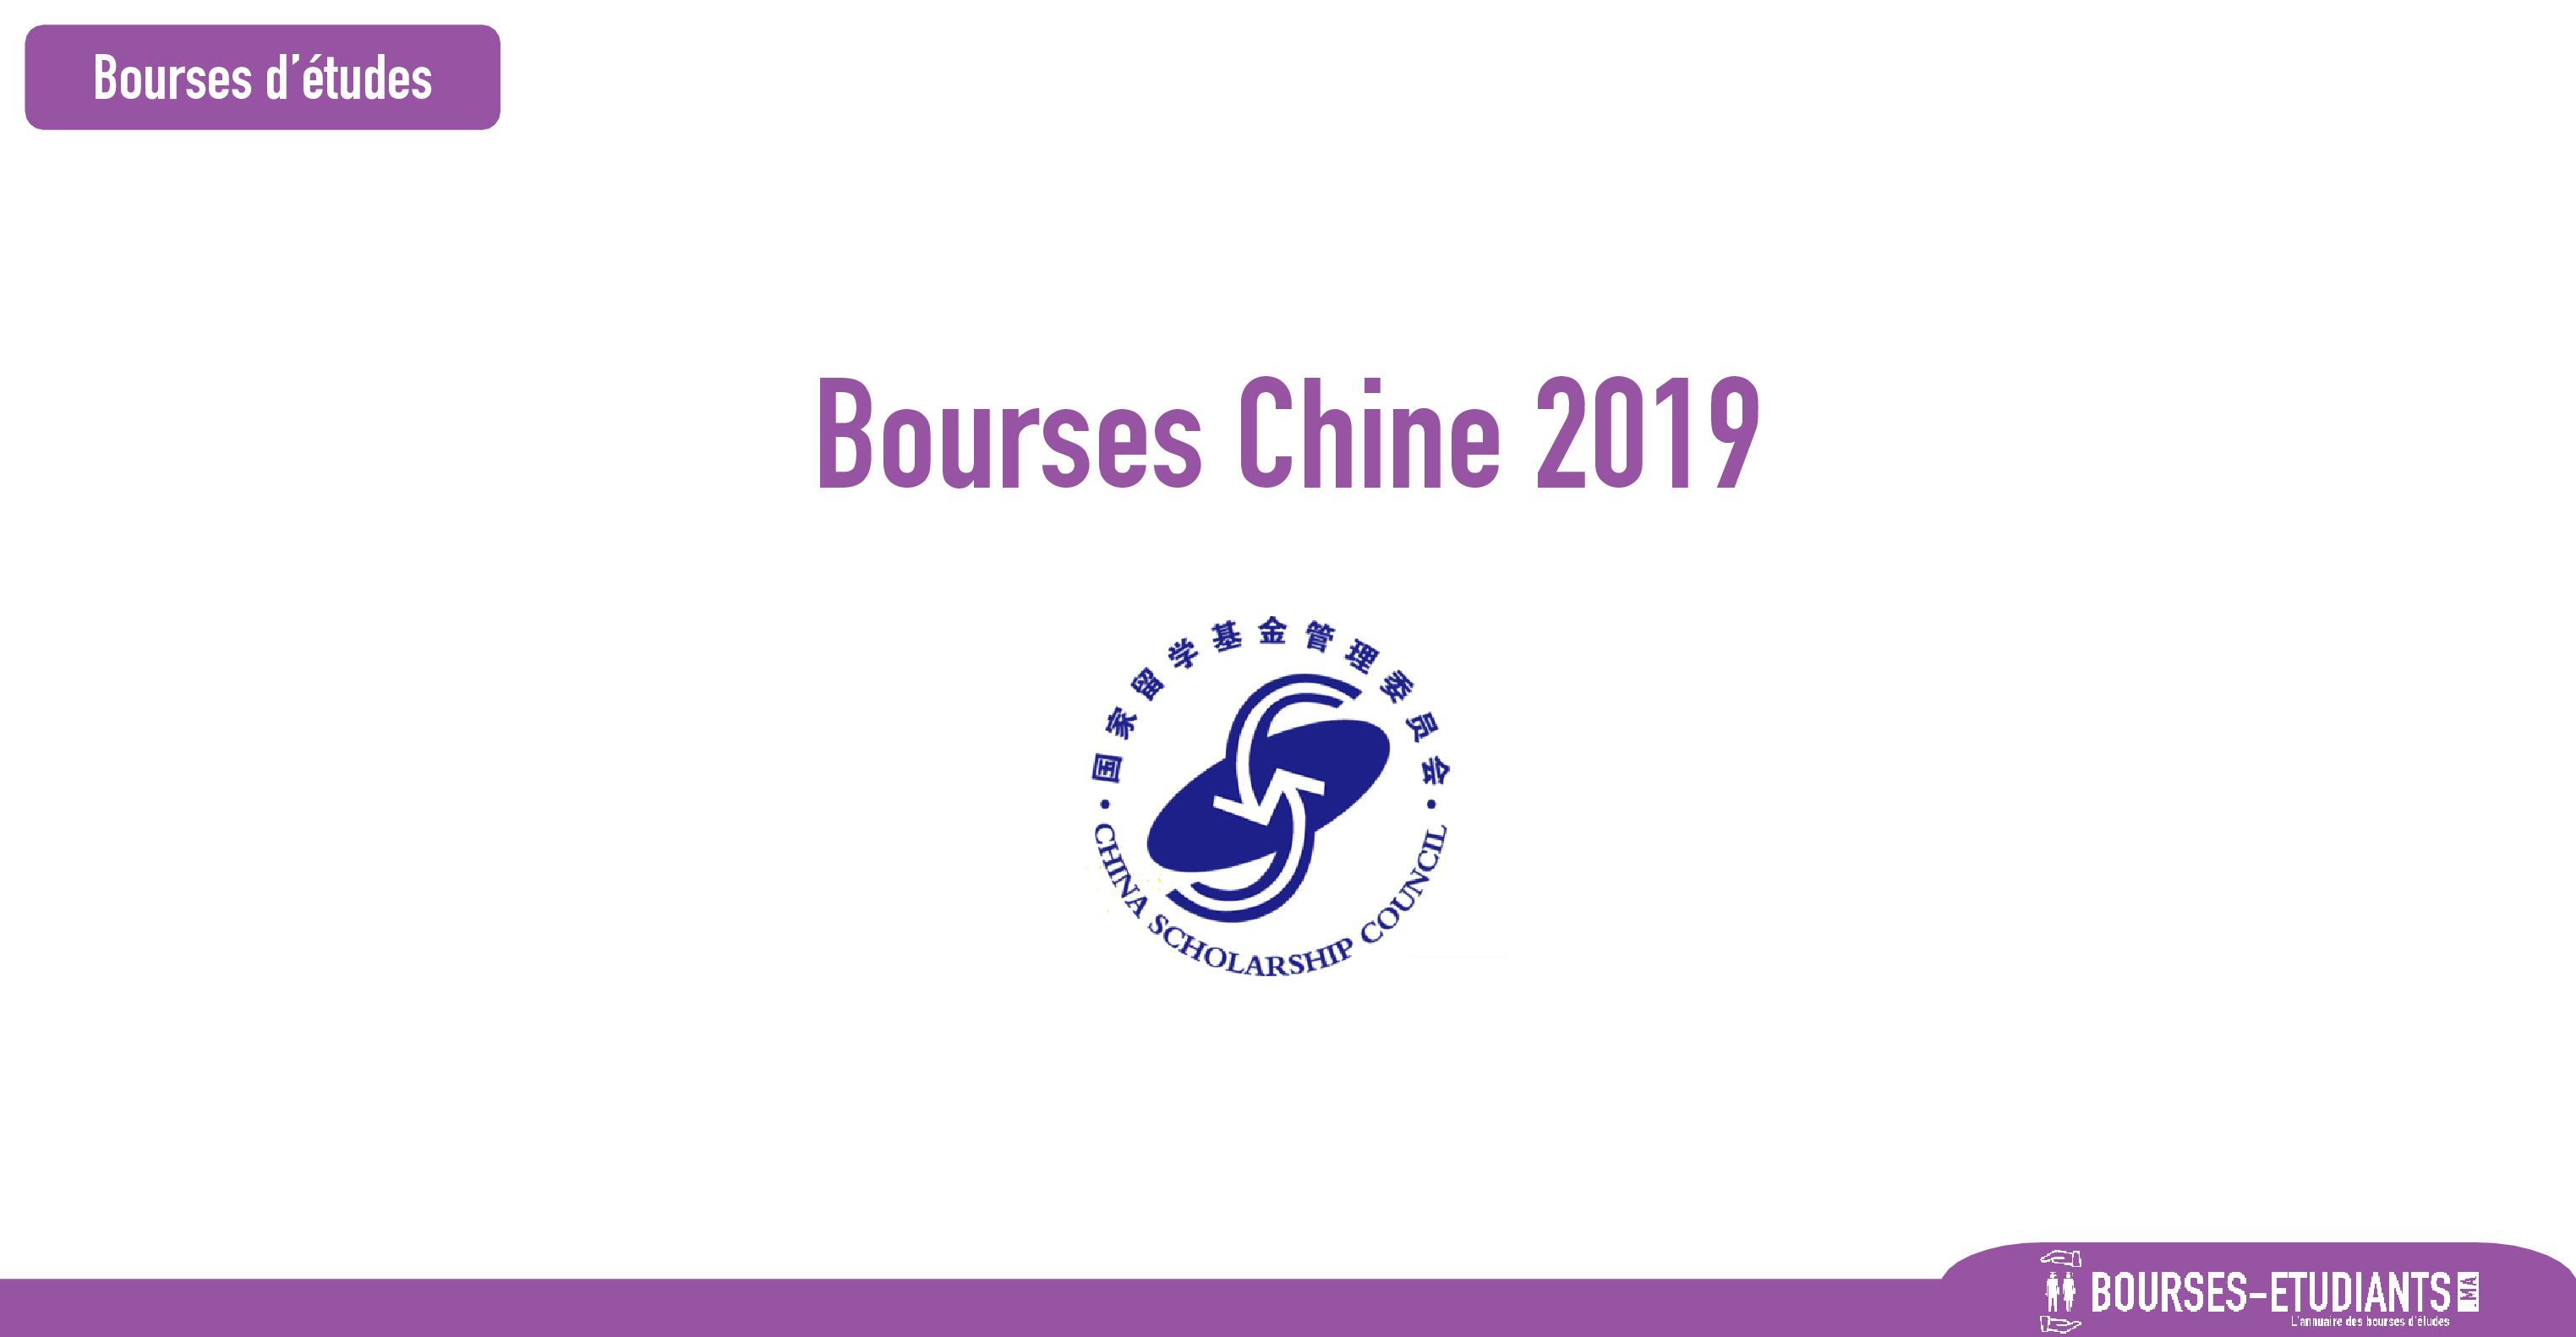 Bourses d'étude Chine 2019 : Yunnan Provincial Government